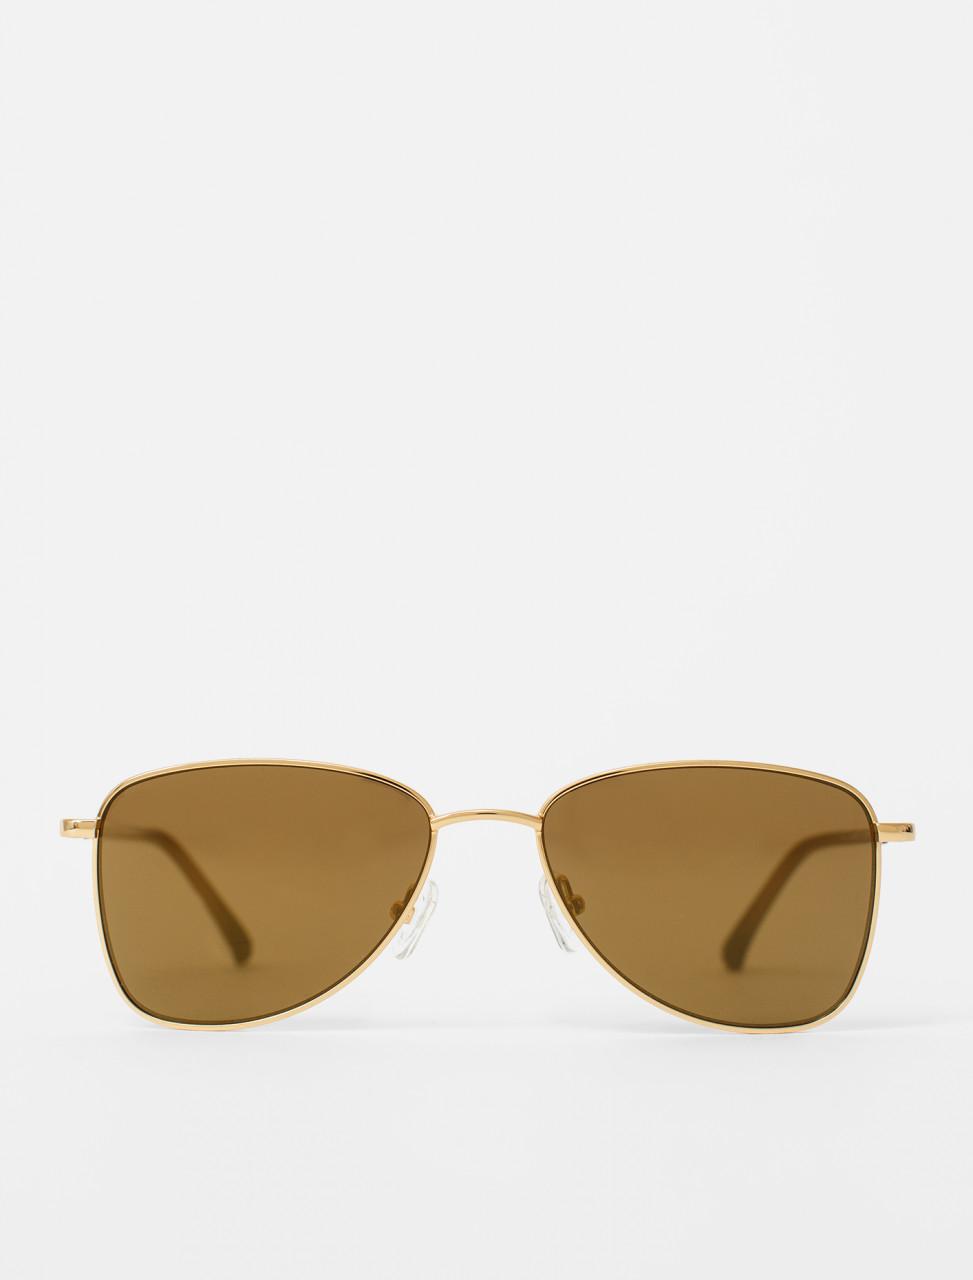 Steel Frame Sunglasses in Gold